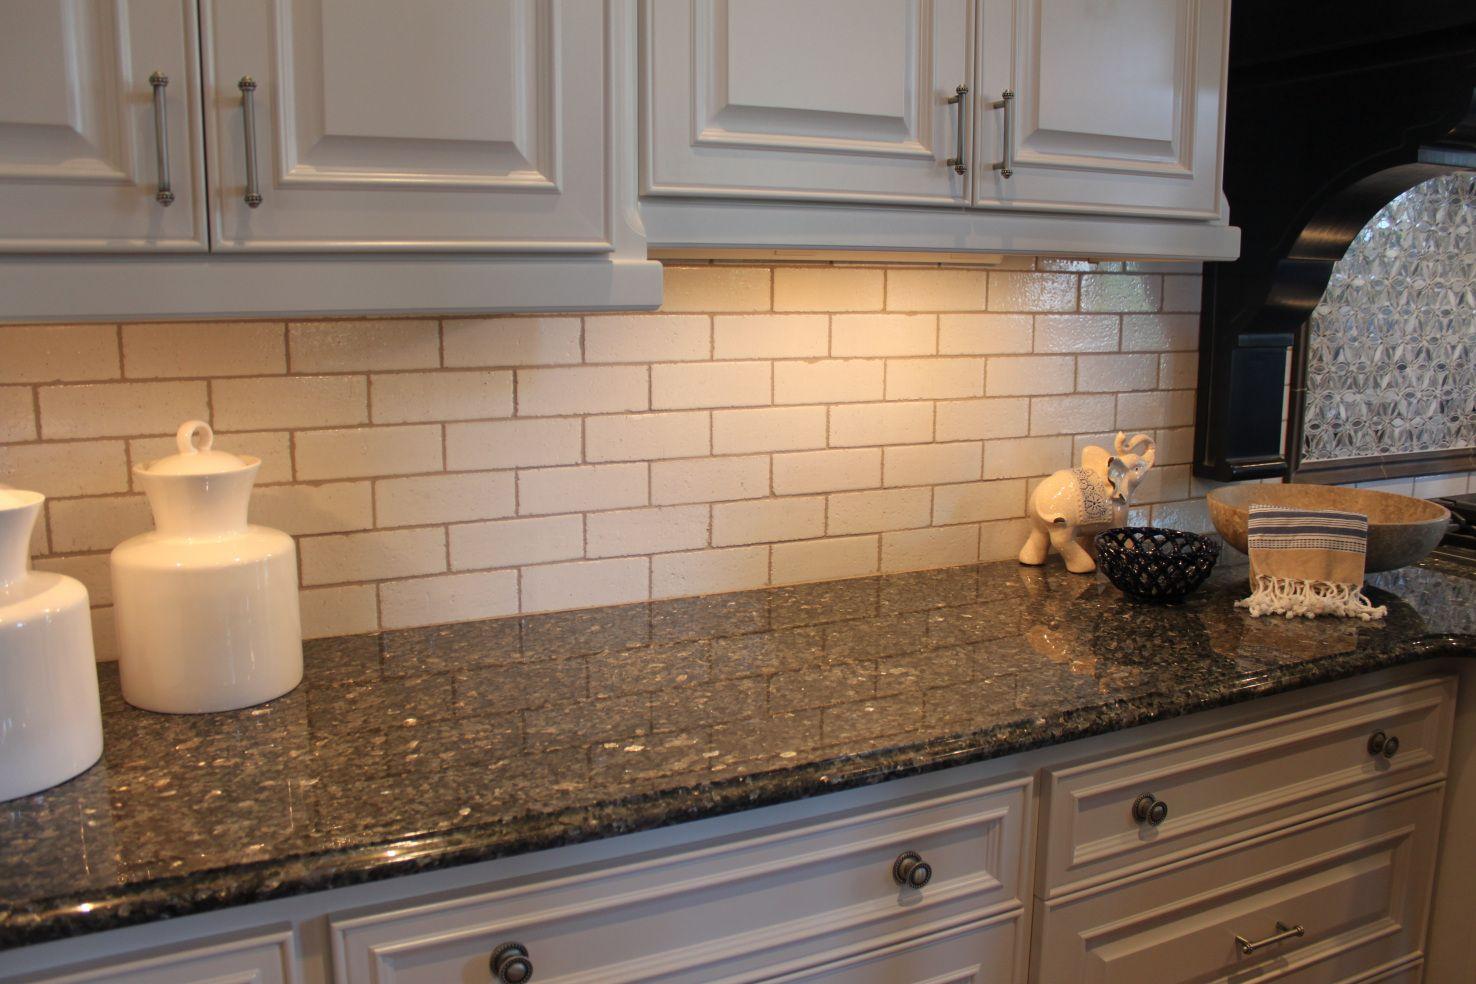 Delicieux 2019 Best Caulk For Granite Countertops   Backsplash For Kitchen Ideas  Check More At Http: